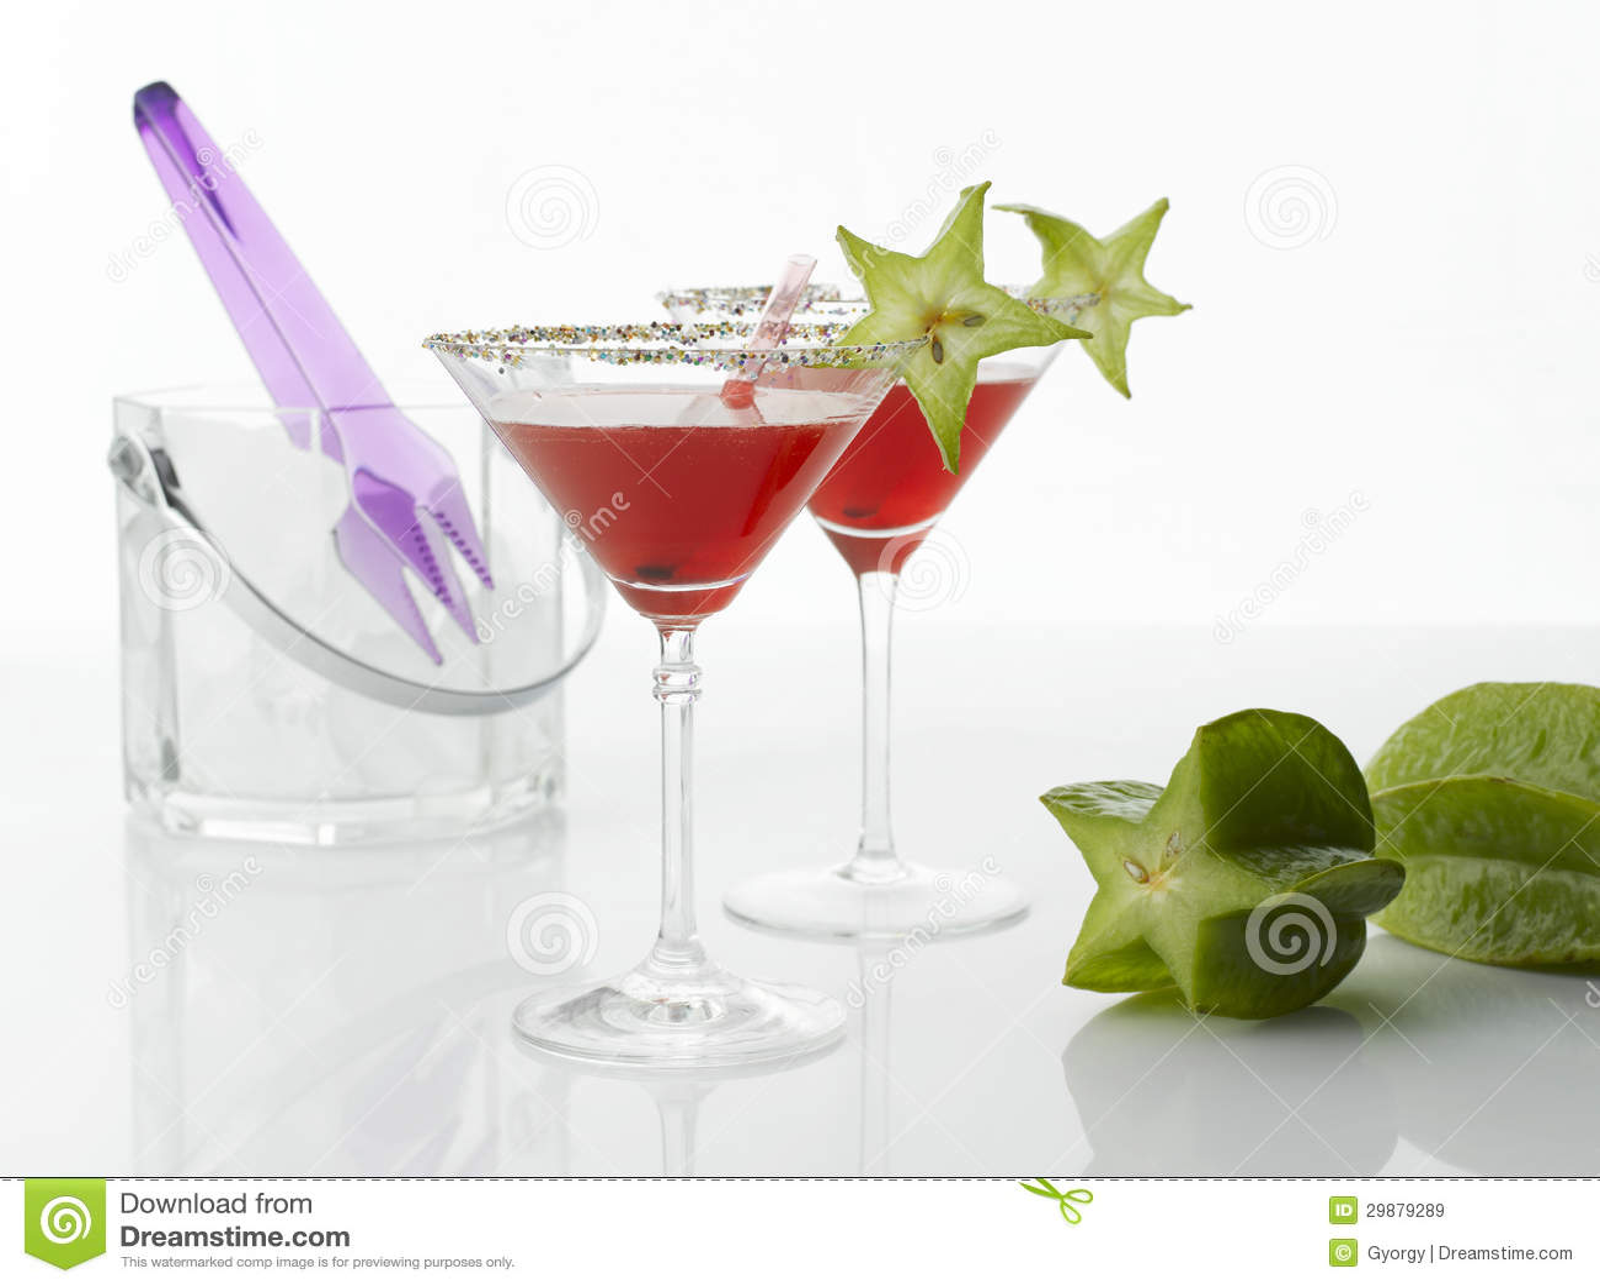 cosmopolitan drink computer wallpaper - photo #21